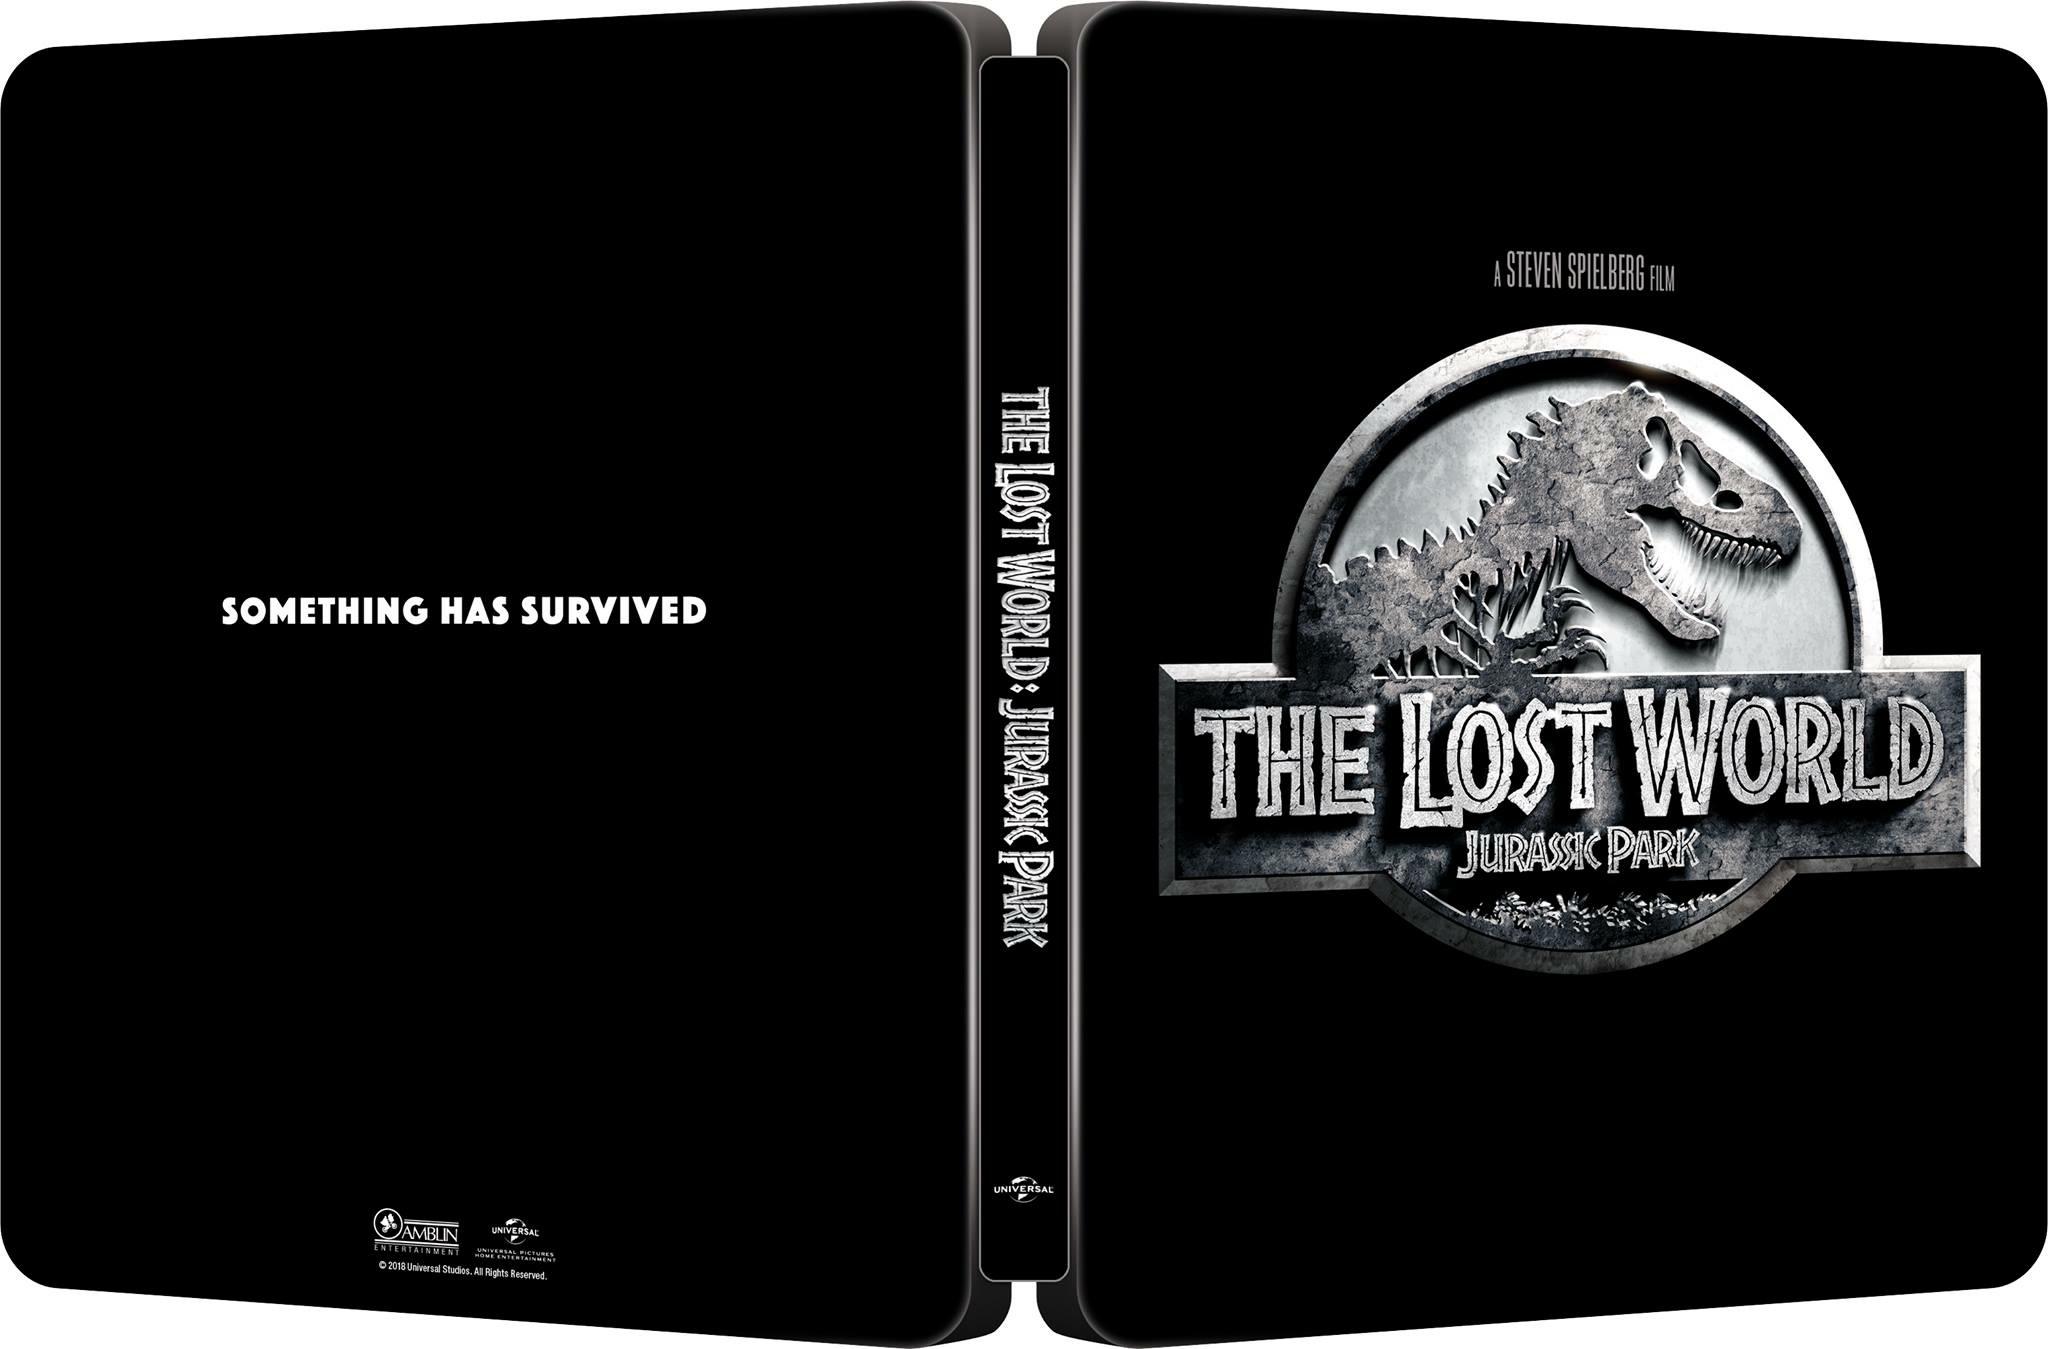 The Lost World Jurassic Park steelbook 1